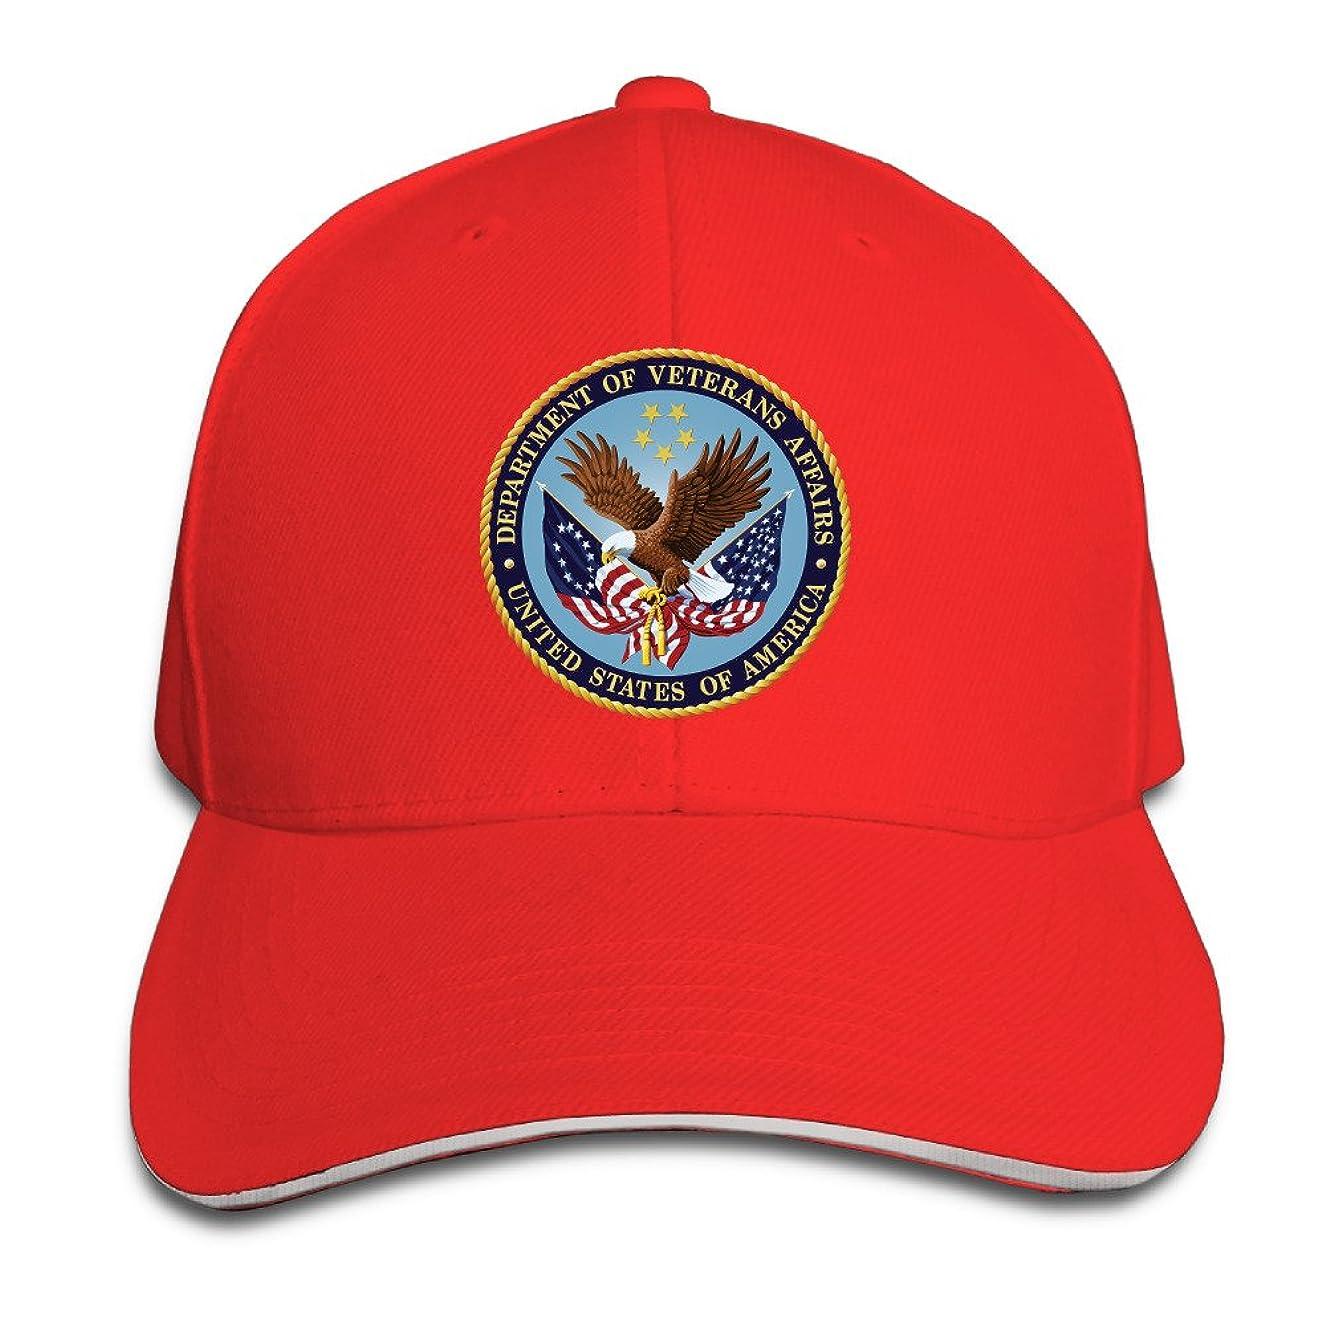 Fitted Department Of Veterans Affairs Usa Baseball Caps Black Sandwich Peaked Cap mkgpxwiyni7158